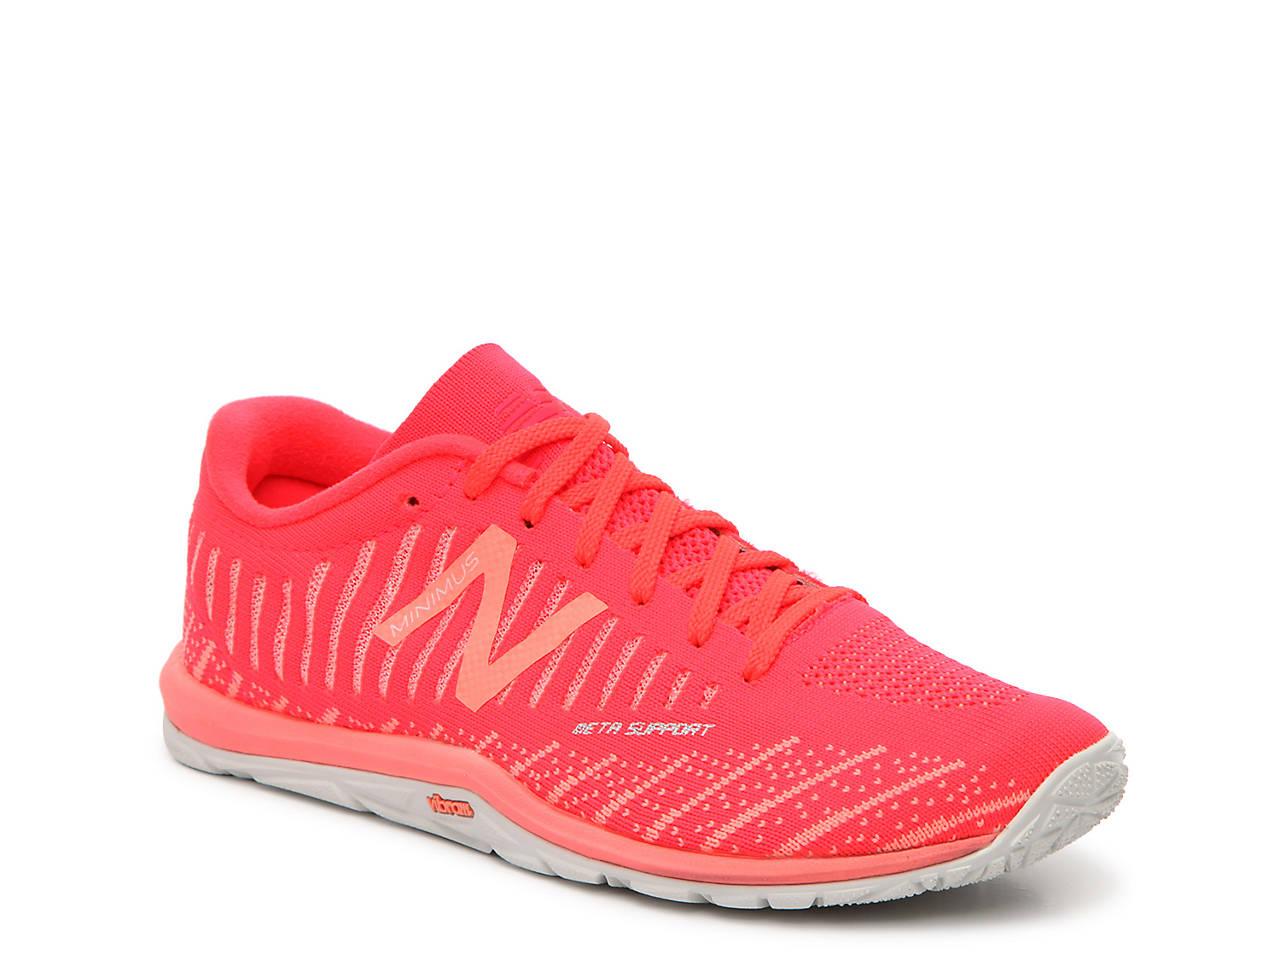 Minimus 20 v7 Training Shoe - Women\u0027s